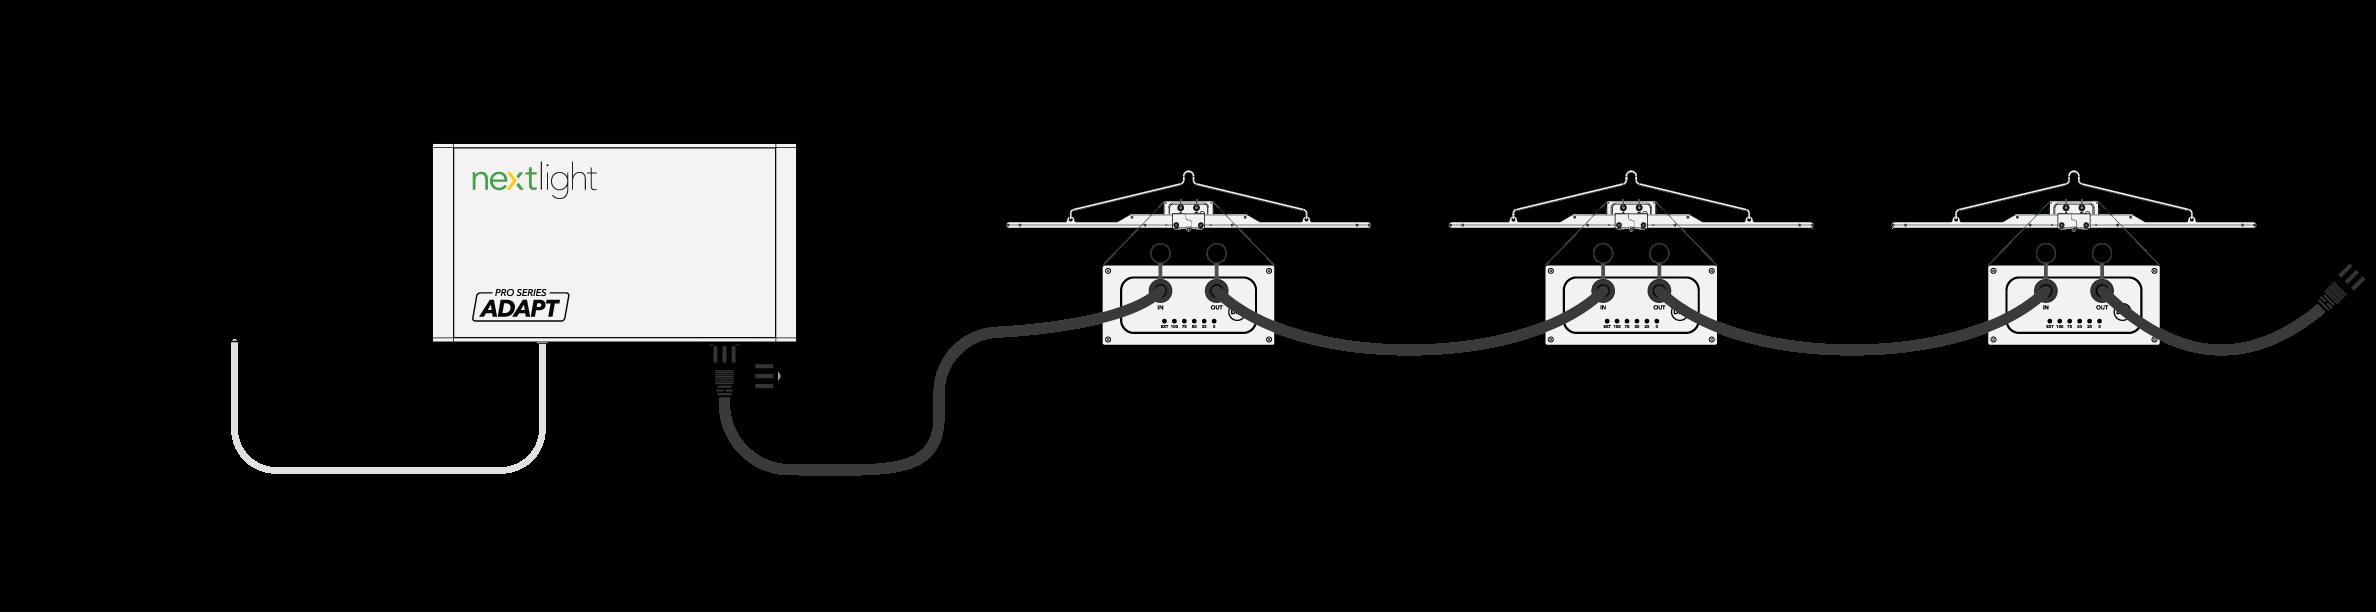 Mega Pro Series Dimming - Adapt Pro